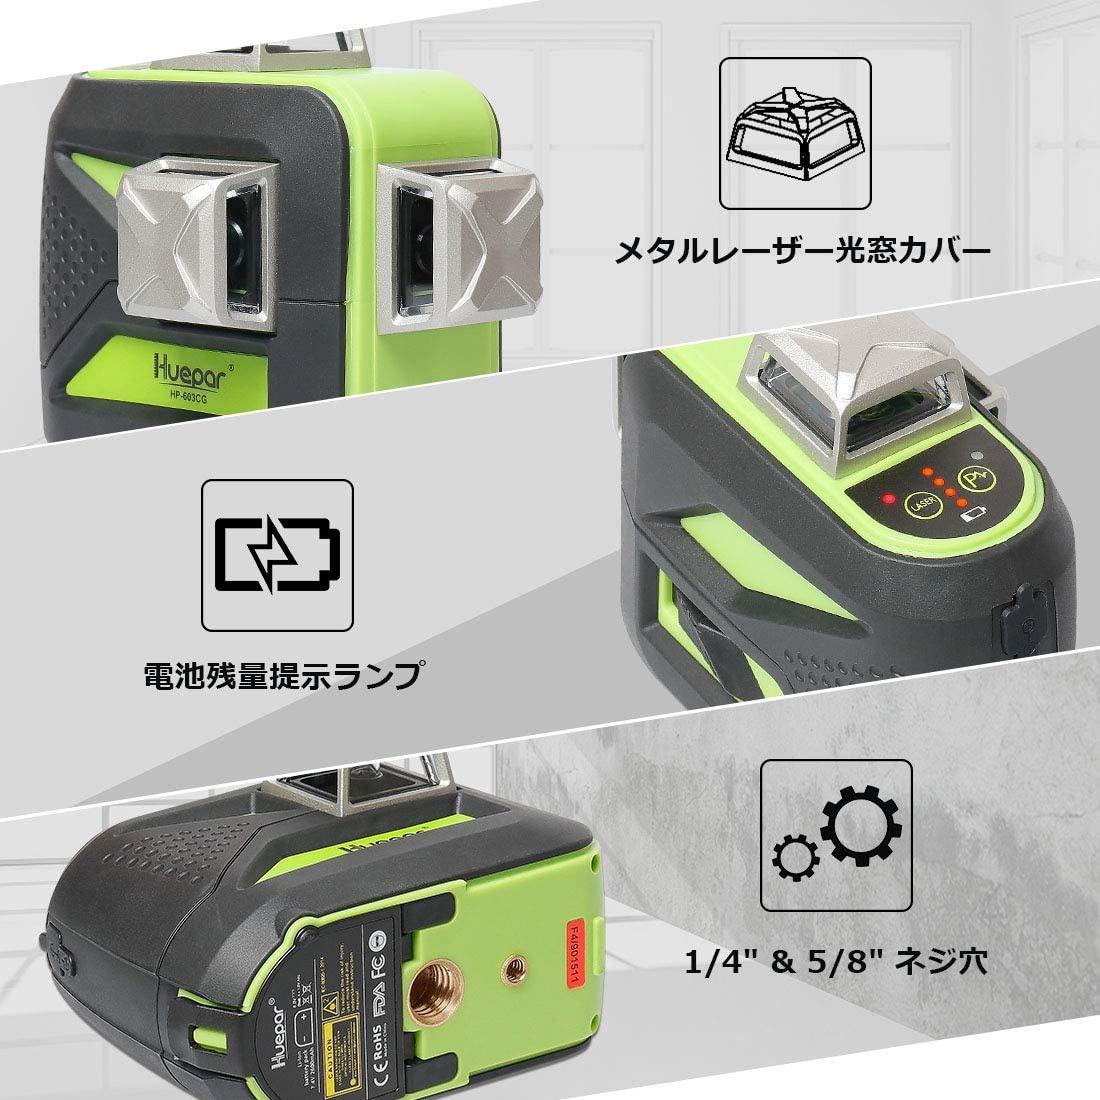 Huepar(ヒューパー) 3x360° レーザー墨出し器 603CGの商品画像4